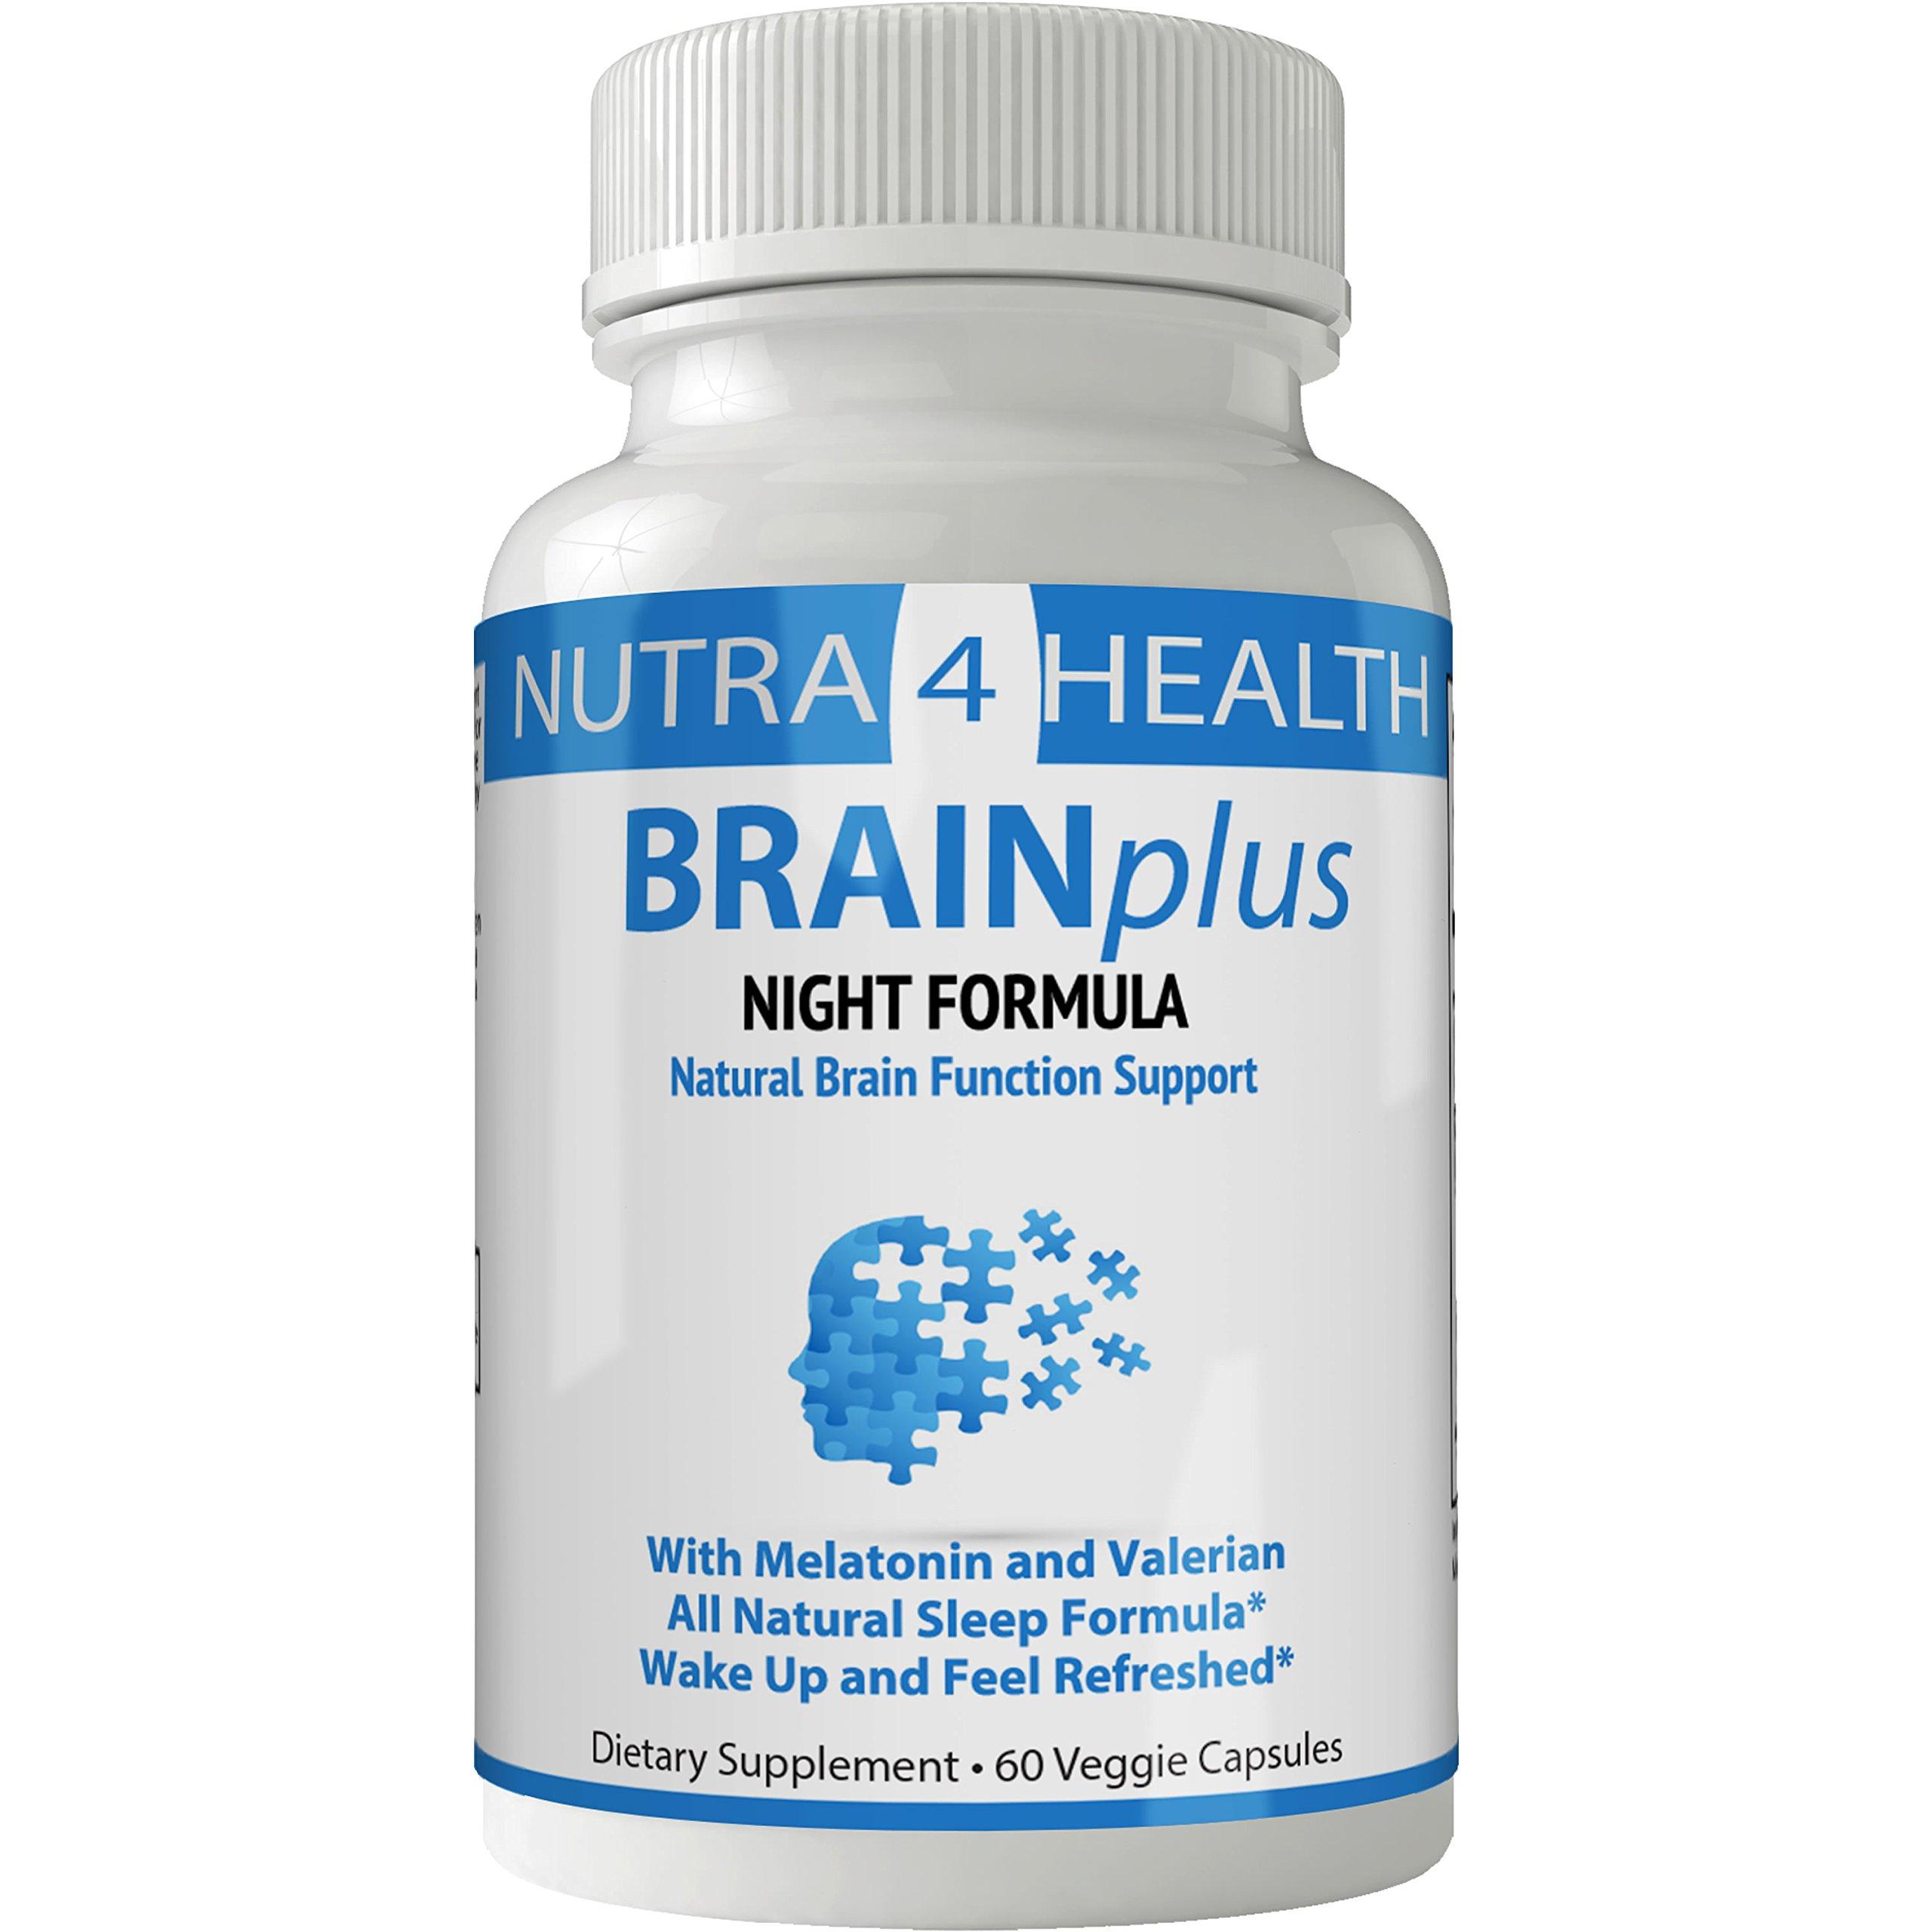 BRAINplus NIGHT Brain IQ Plus Capsules | Night Sleep Nootropics Booster Pills for Brain Plus IQ Original from nutra4health | Rapidly increase REM | Brain Booster Supplement for FOCUS, CLARITY & MEMORY